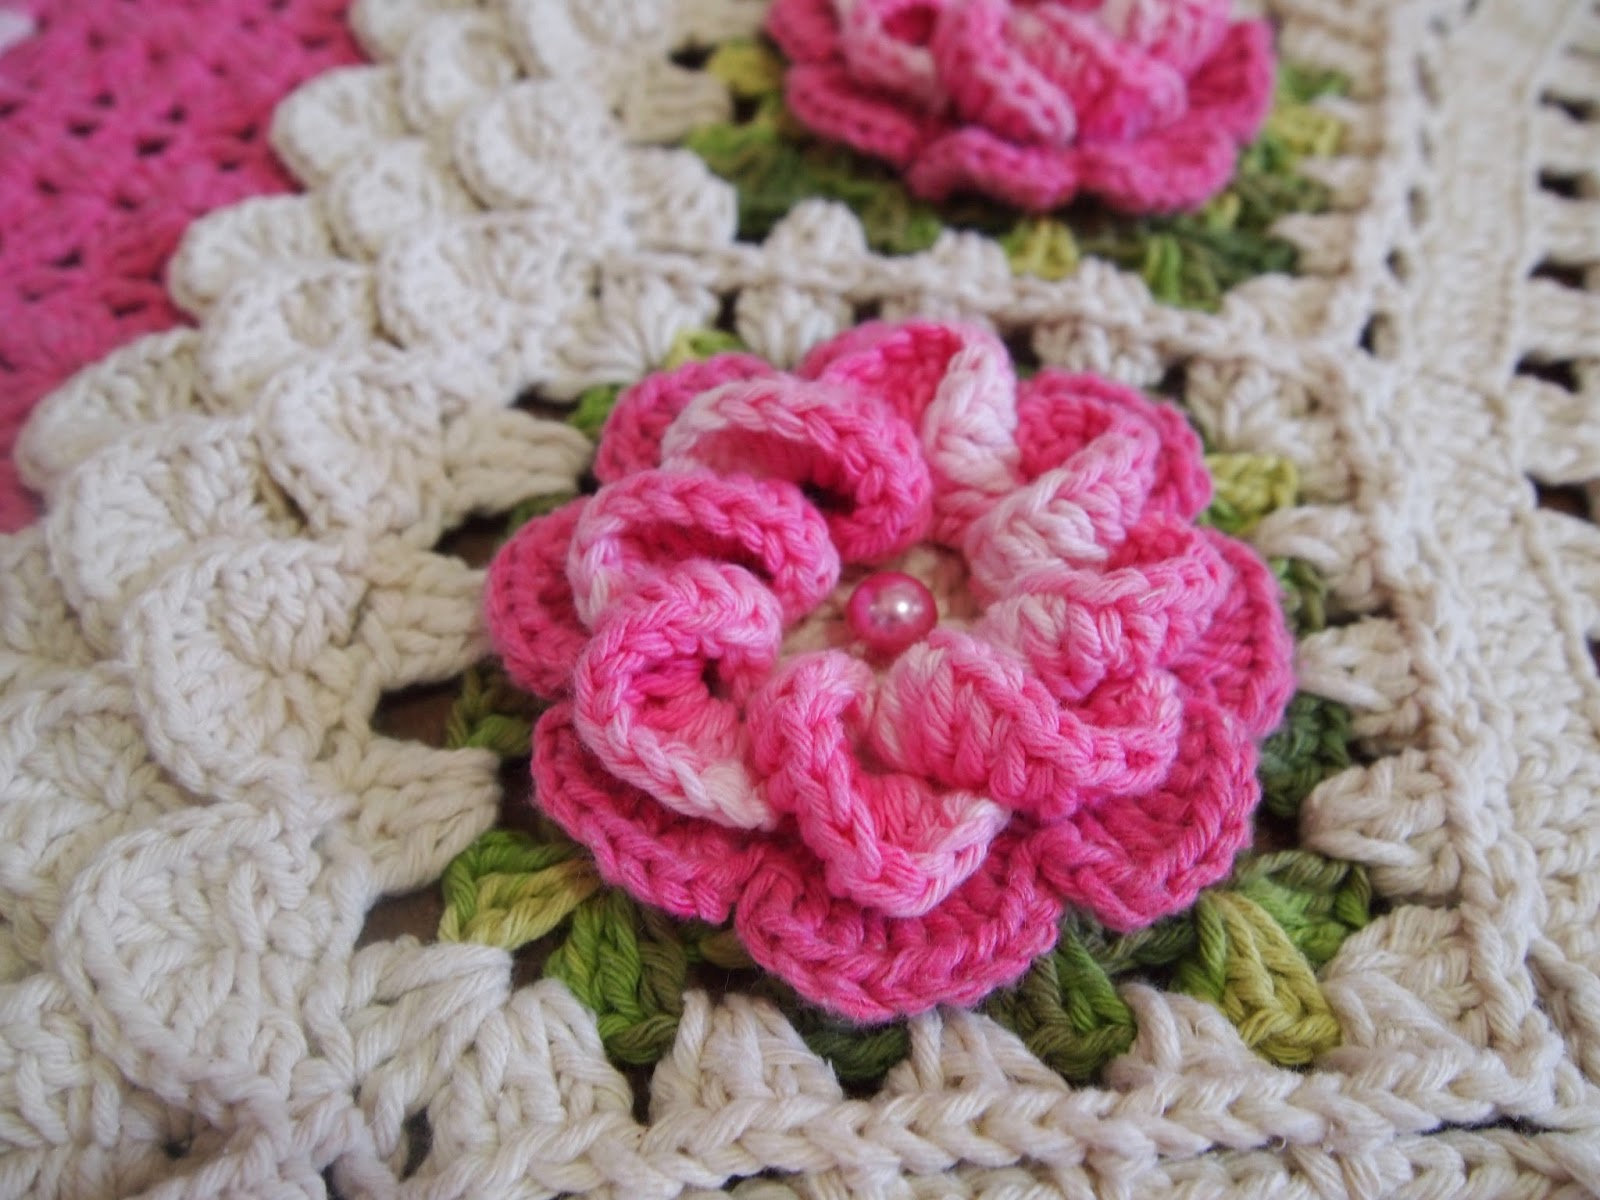 flores de crochê caracol com perola